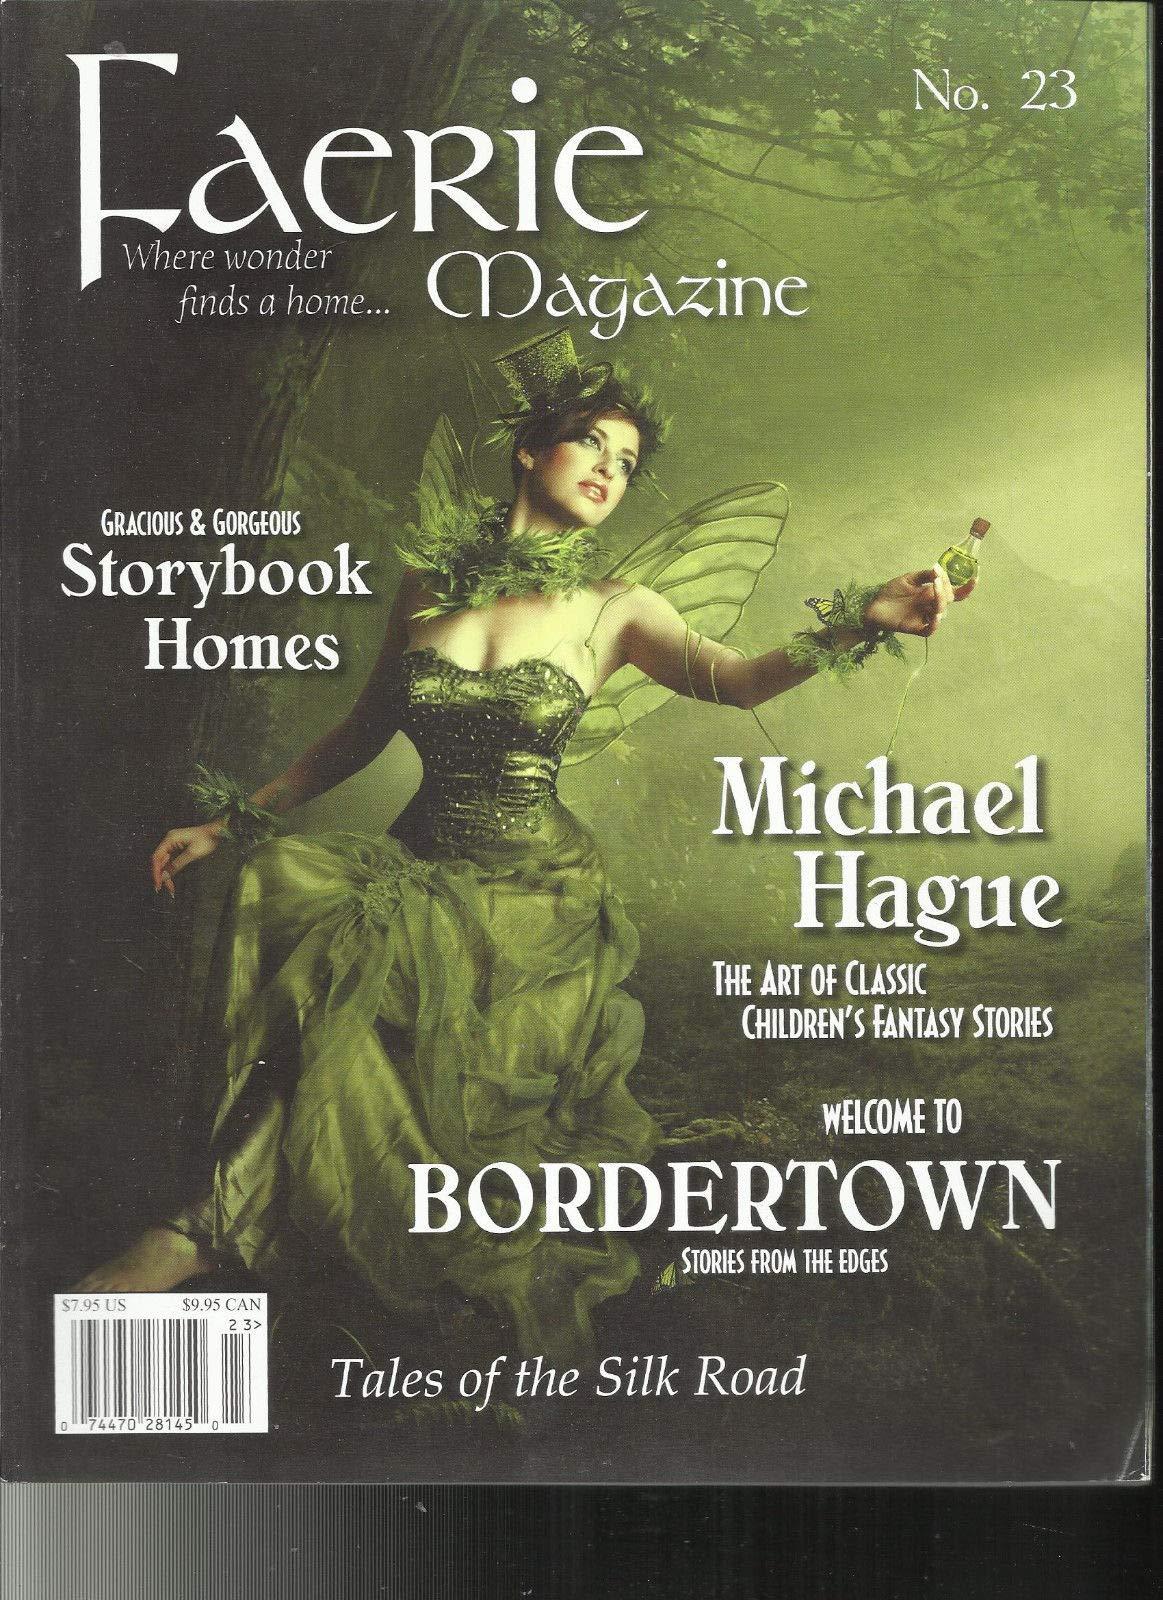 FAERIE MAGAZINE, WHERE WONDER FINDS A HOME NO. 23 VOLUME, 7 ISSUE # 1